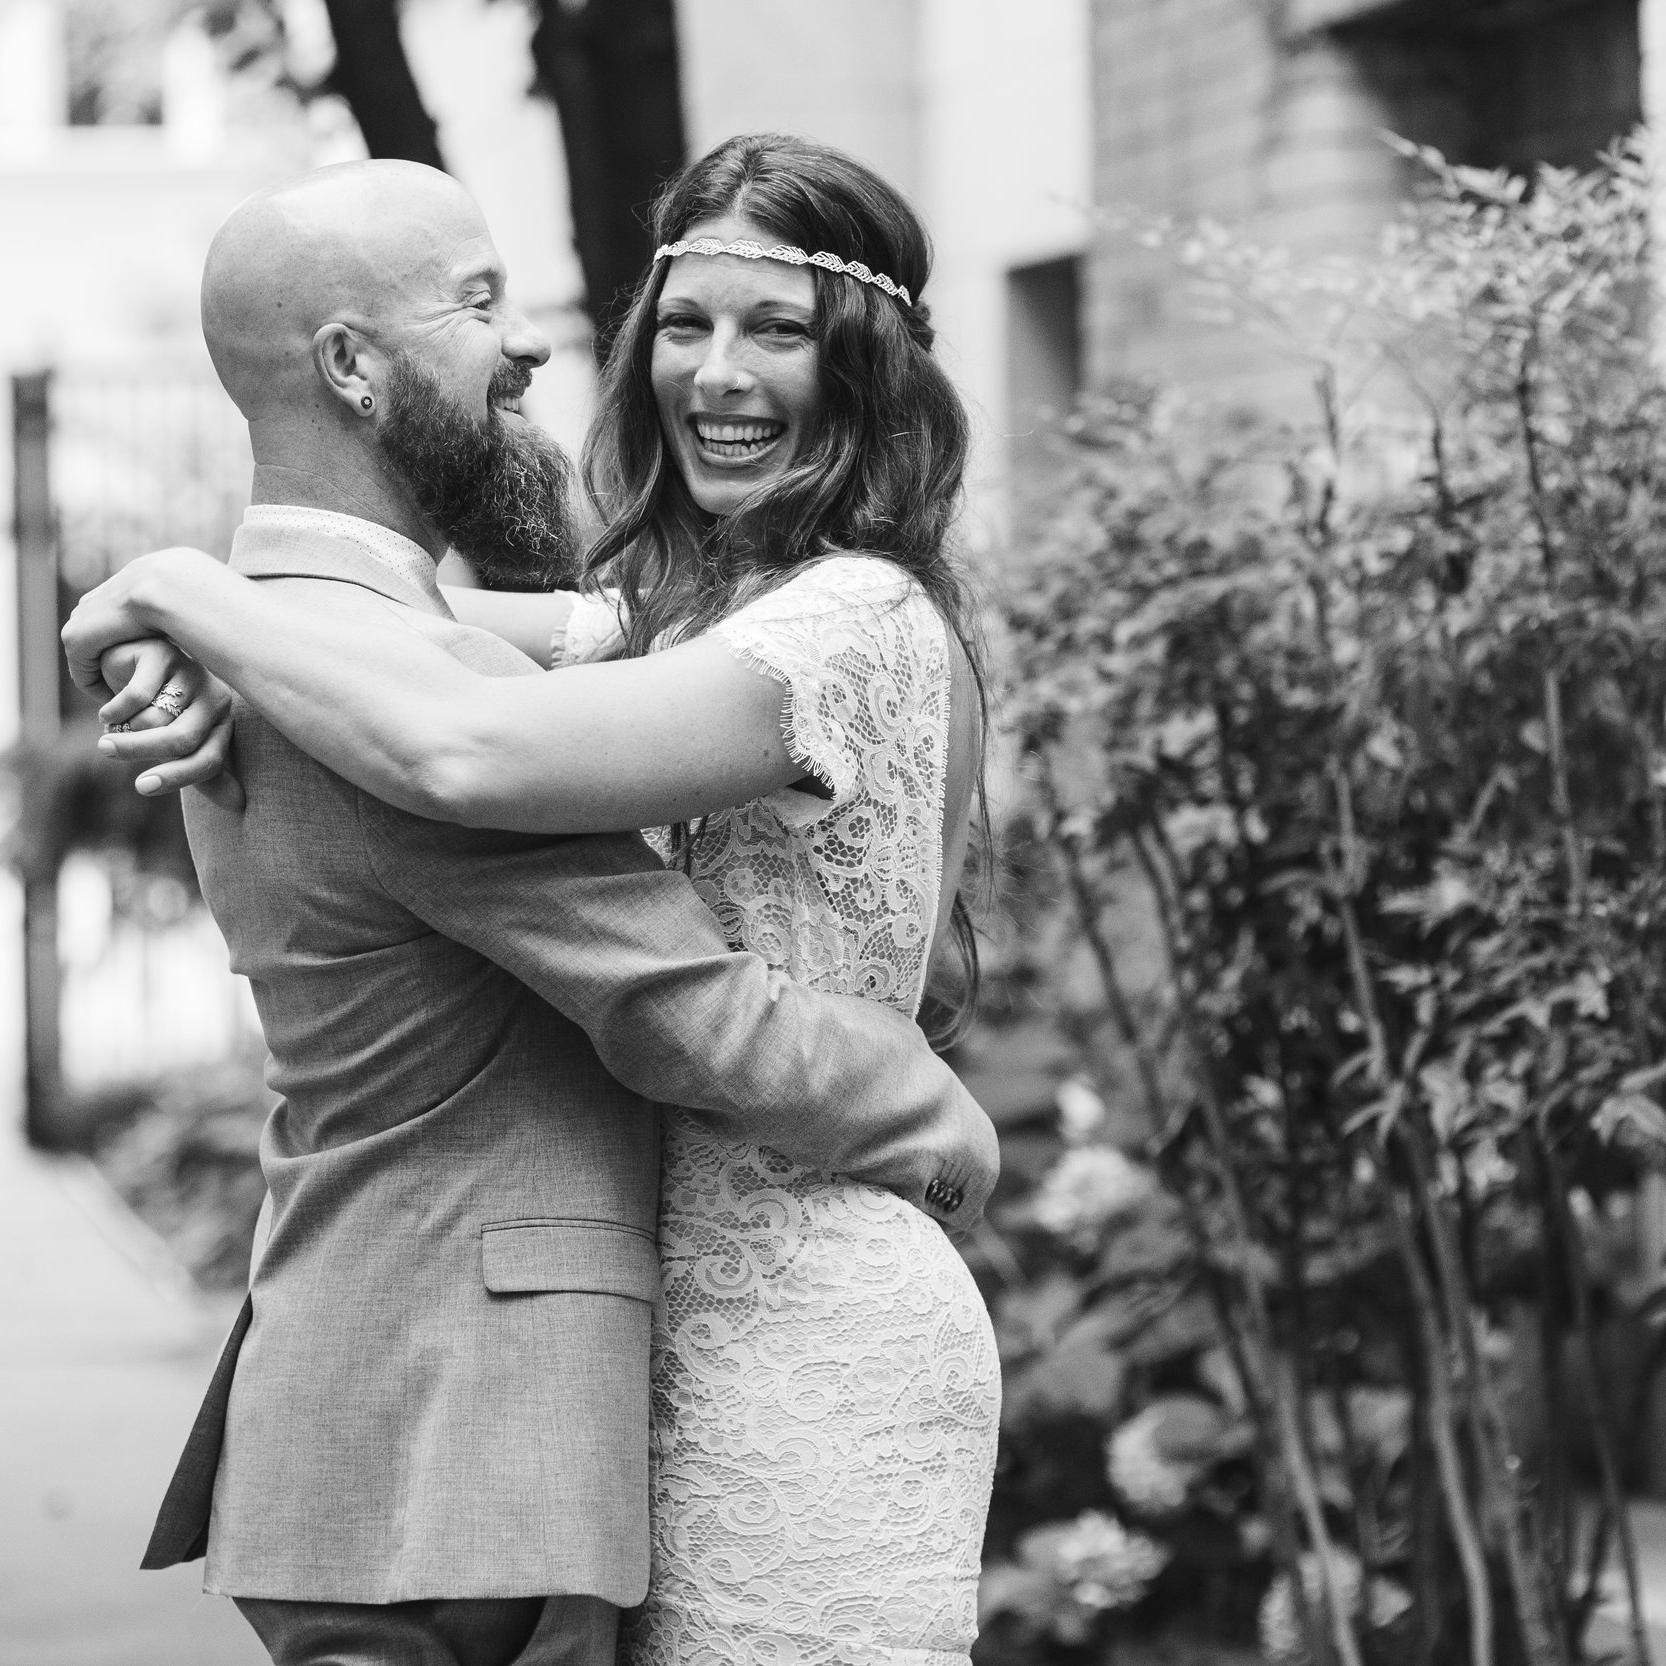 Sarah & Charlie's wedding!